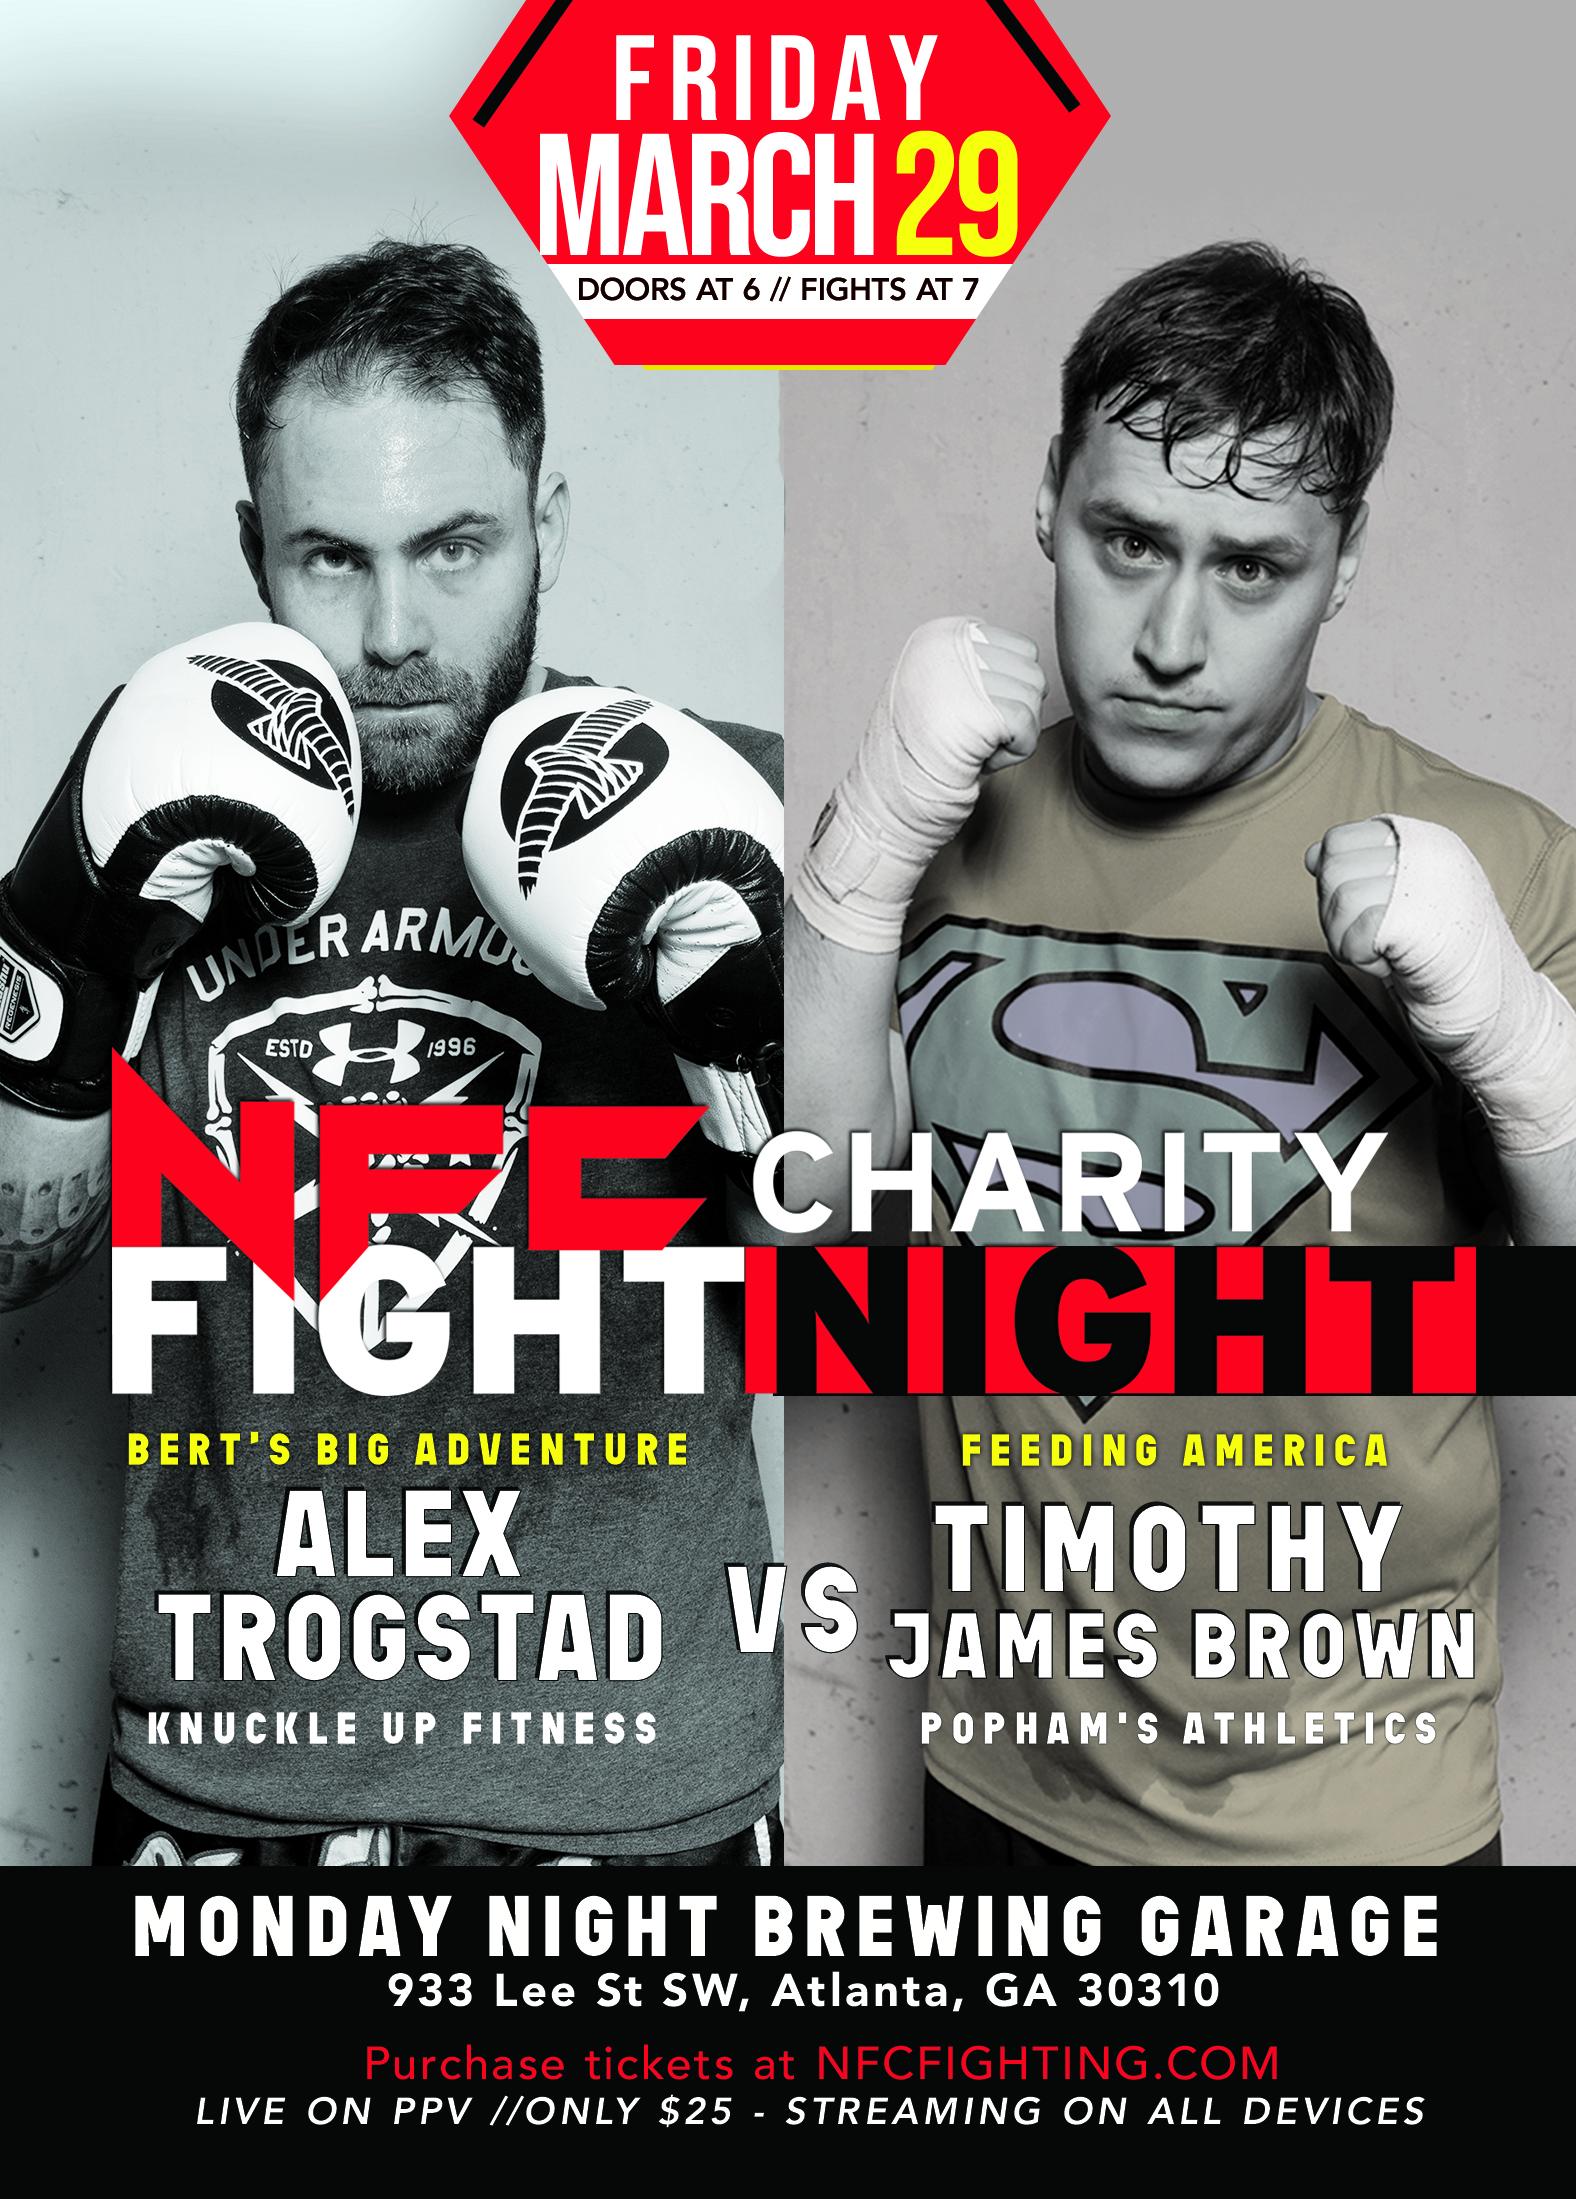 FightNightCharity_TrogstadJamesBrown.jpg